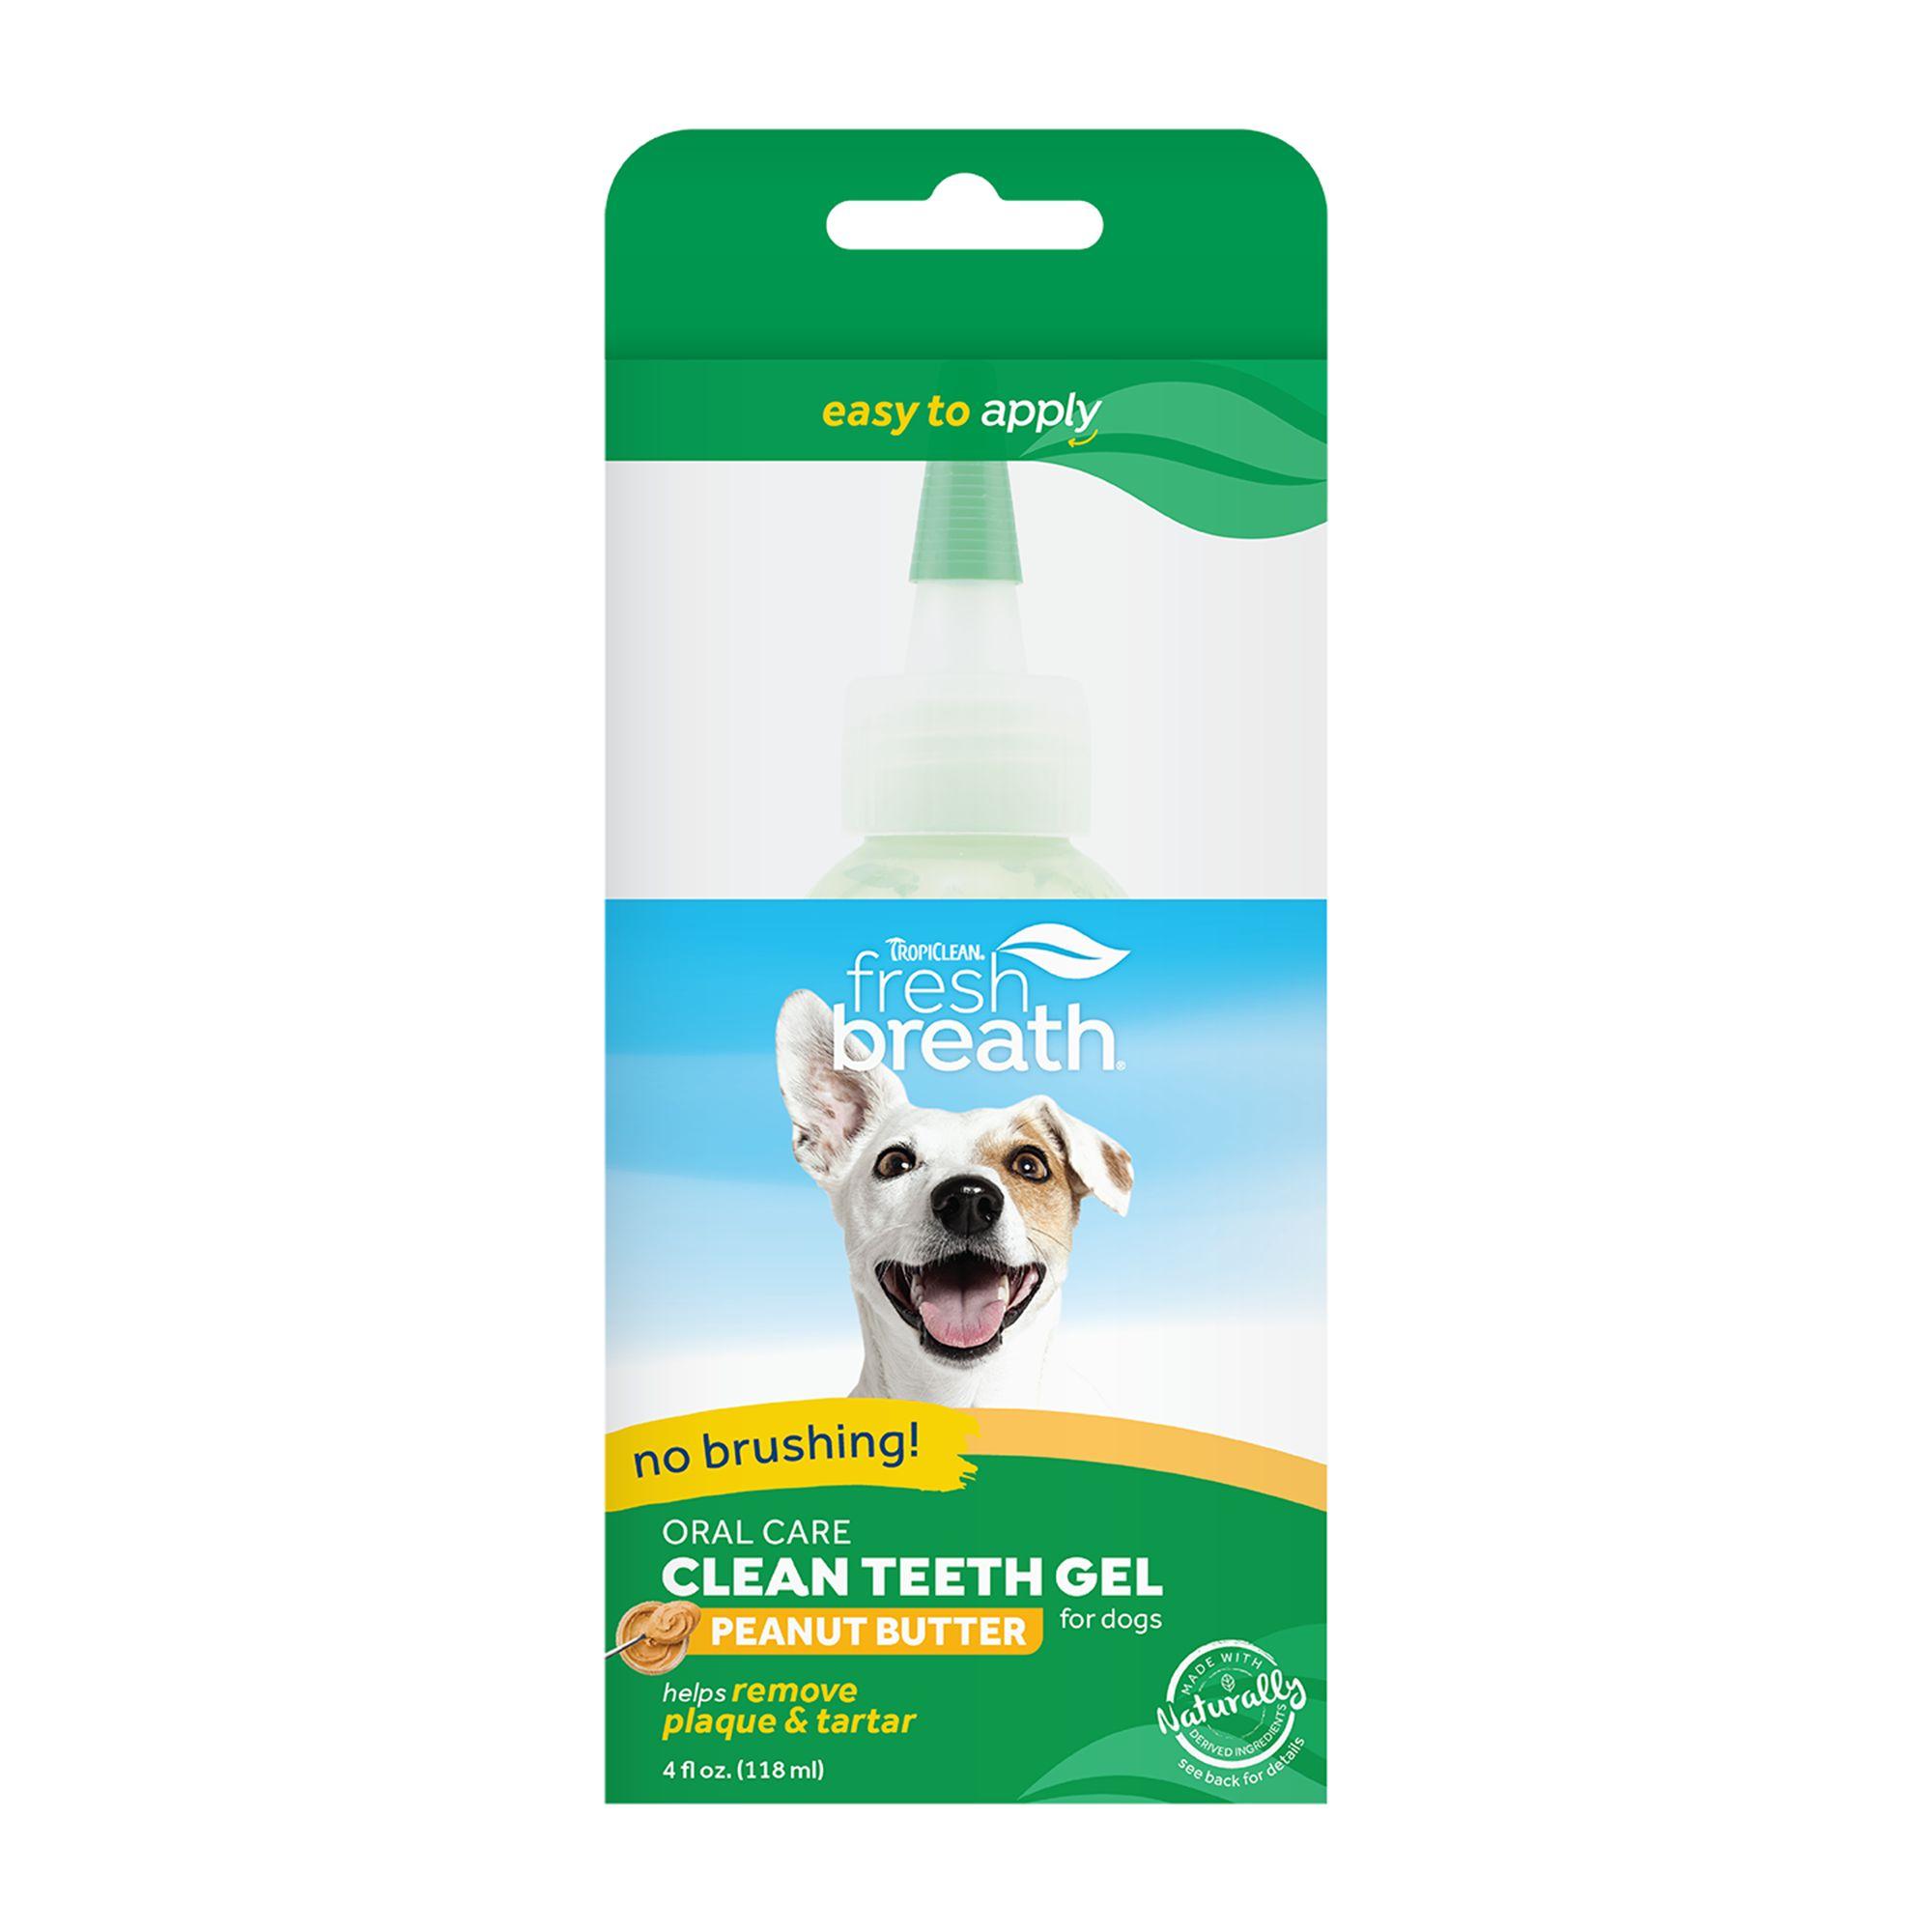 TropiClean Fresh Breath Clean Teeth Oral Care Gel size: 4 Fl Oz